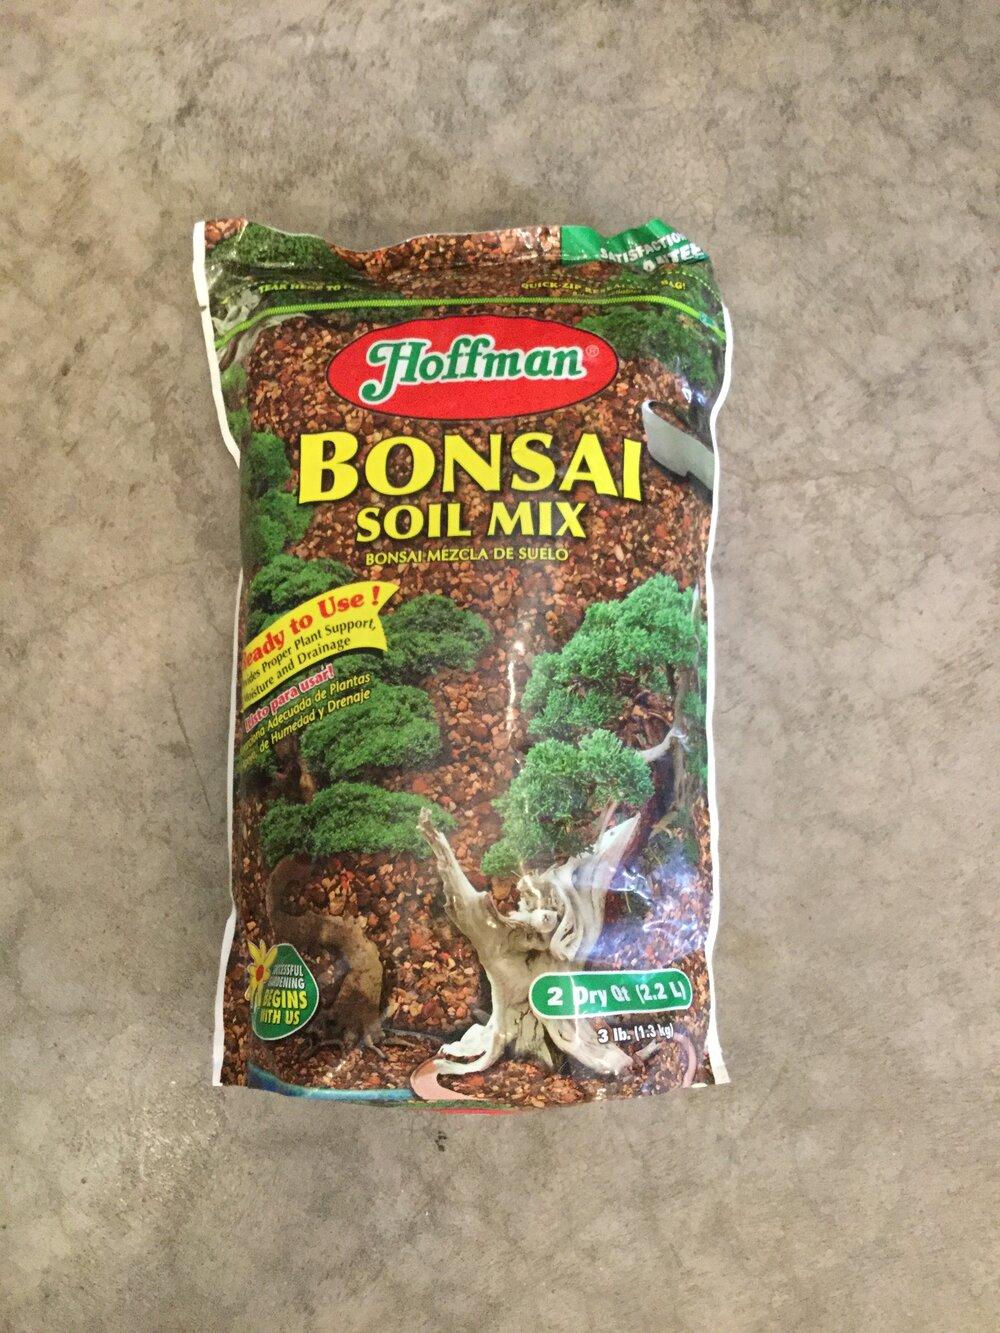 Hoffman Bonsai Soil Mix 2 Qt Iowa City Landscaping